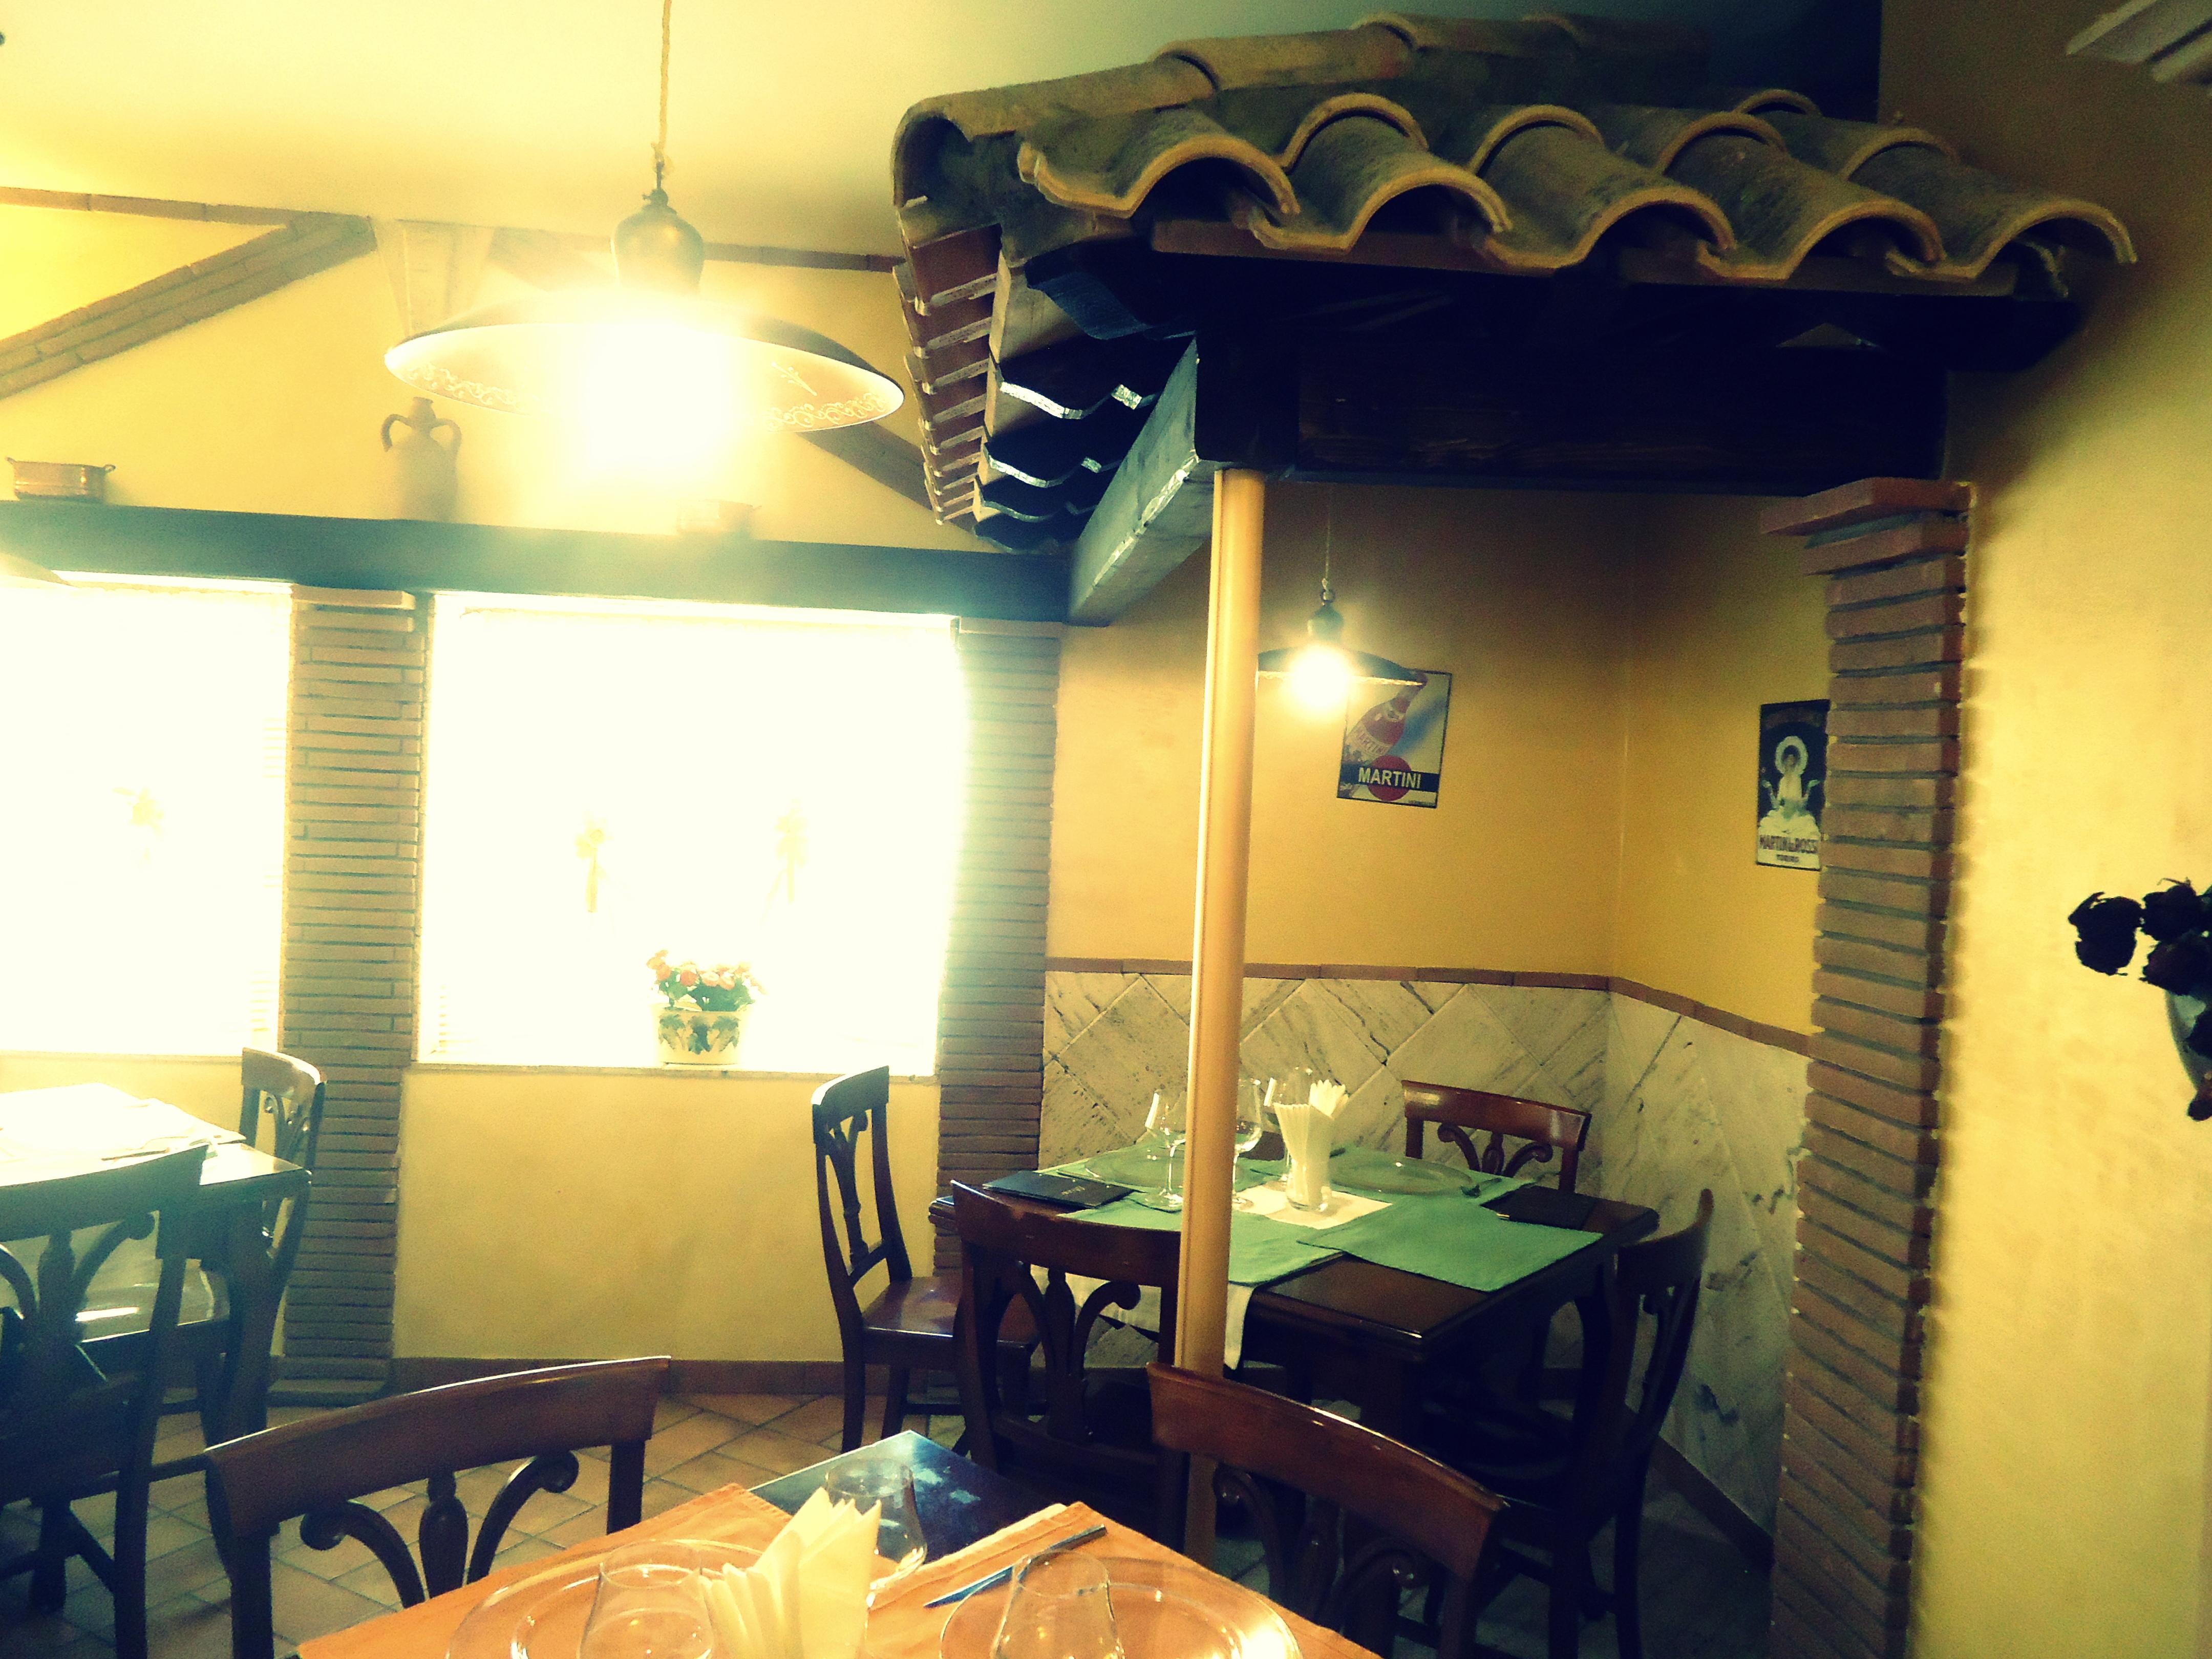 EATING OUT: DA MARIA ITALIAN RESTAURANT & DELICATESSEN | The Kink And I